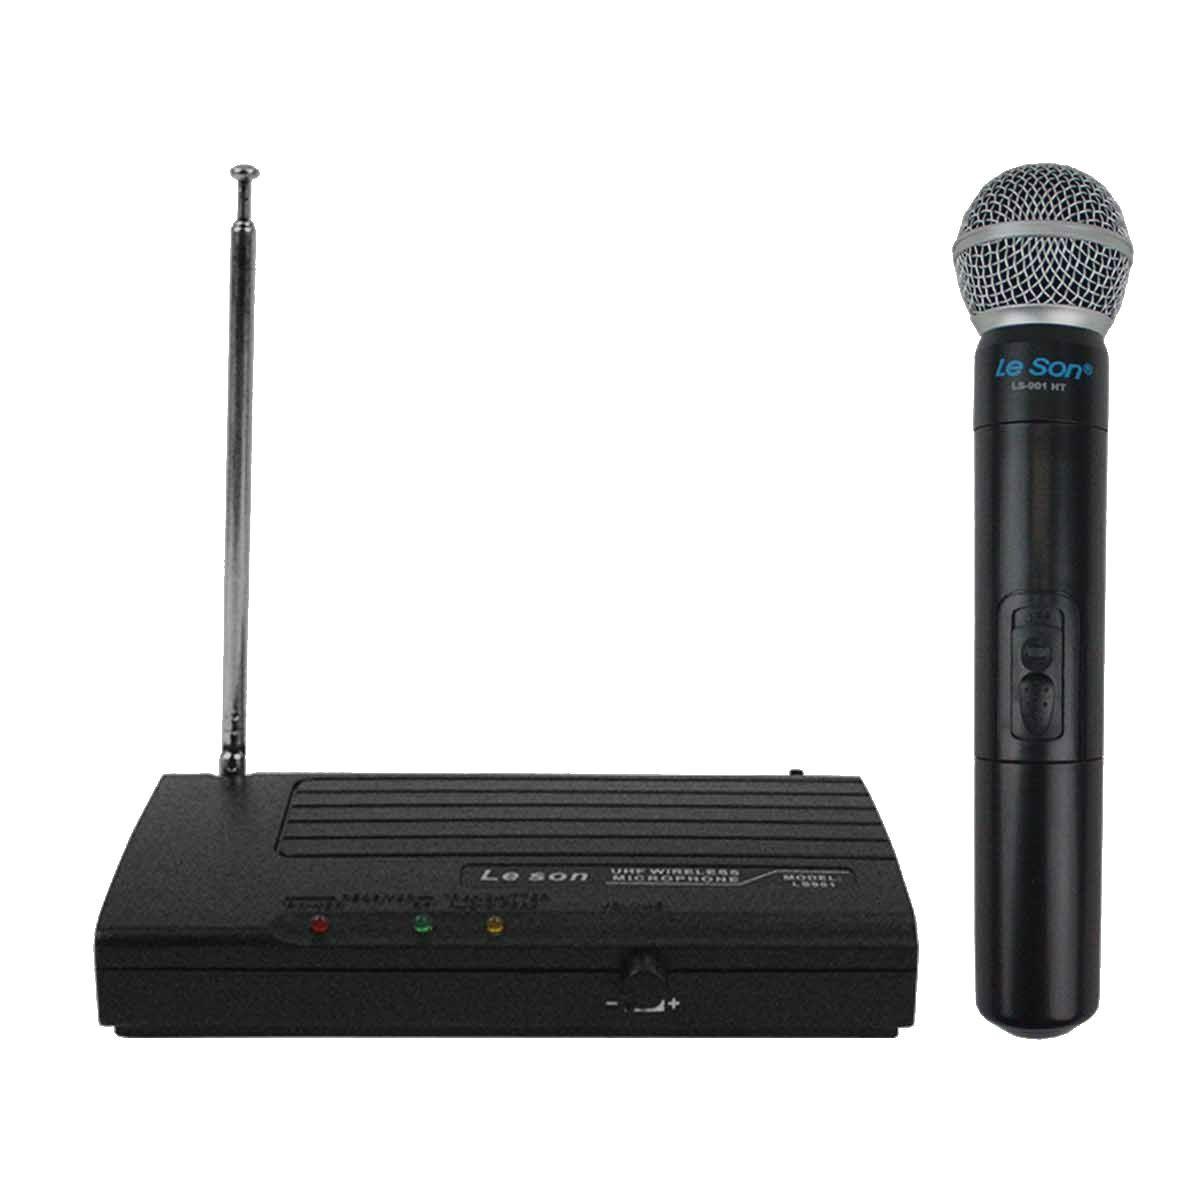 MICROFONE S/ FIO UHF MAO LS-801 HT LS-901 LESON